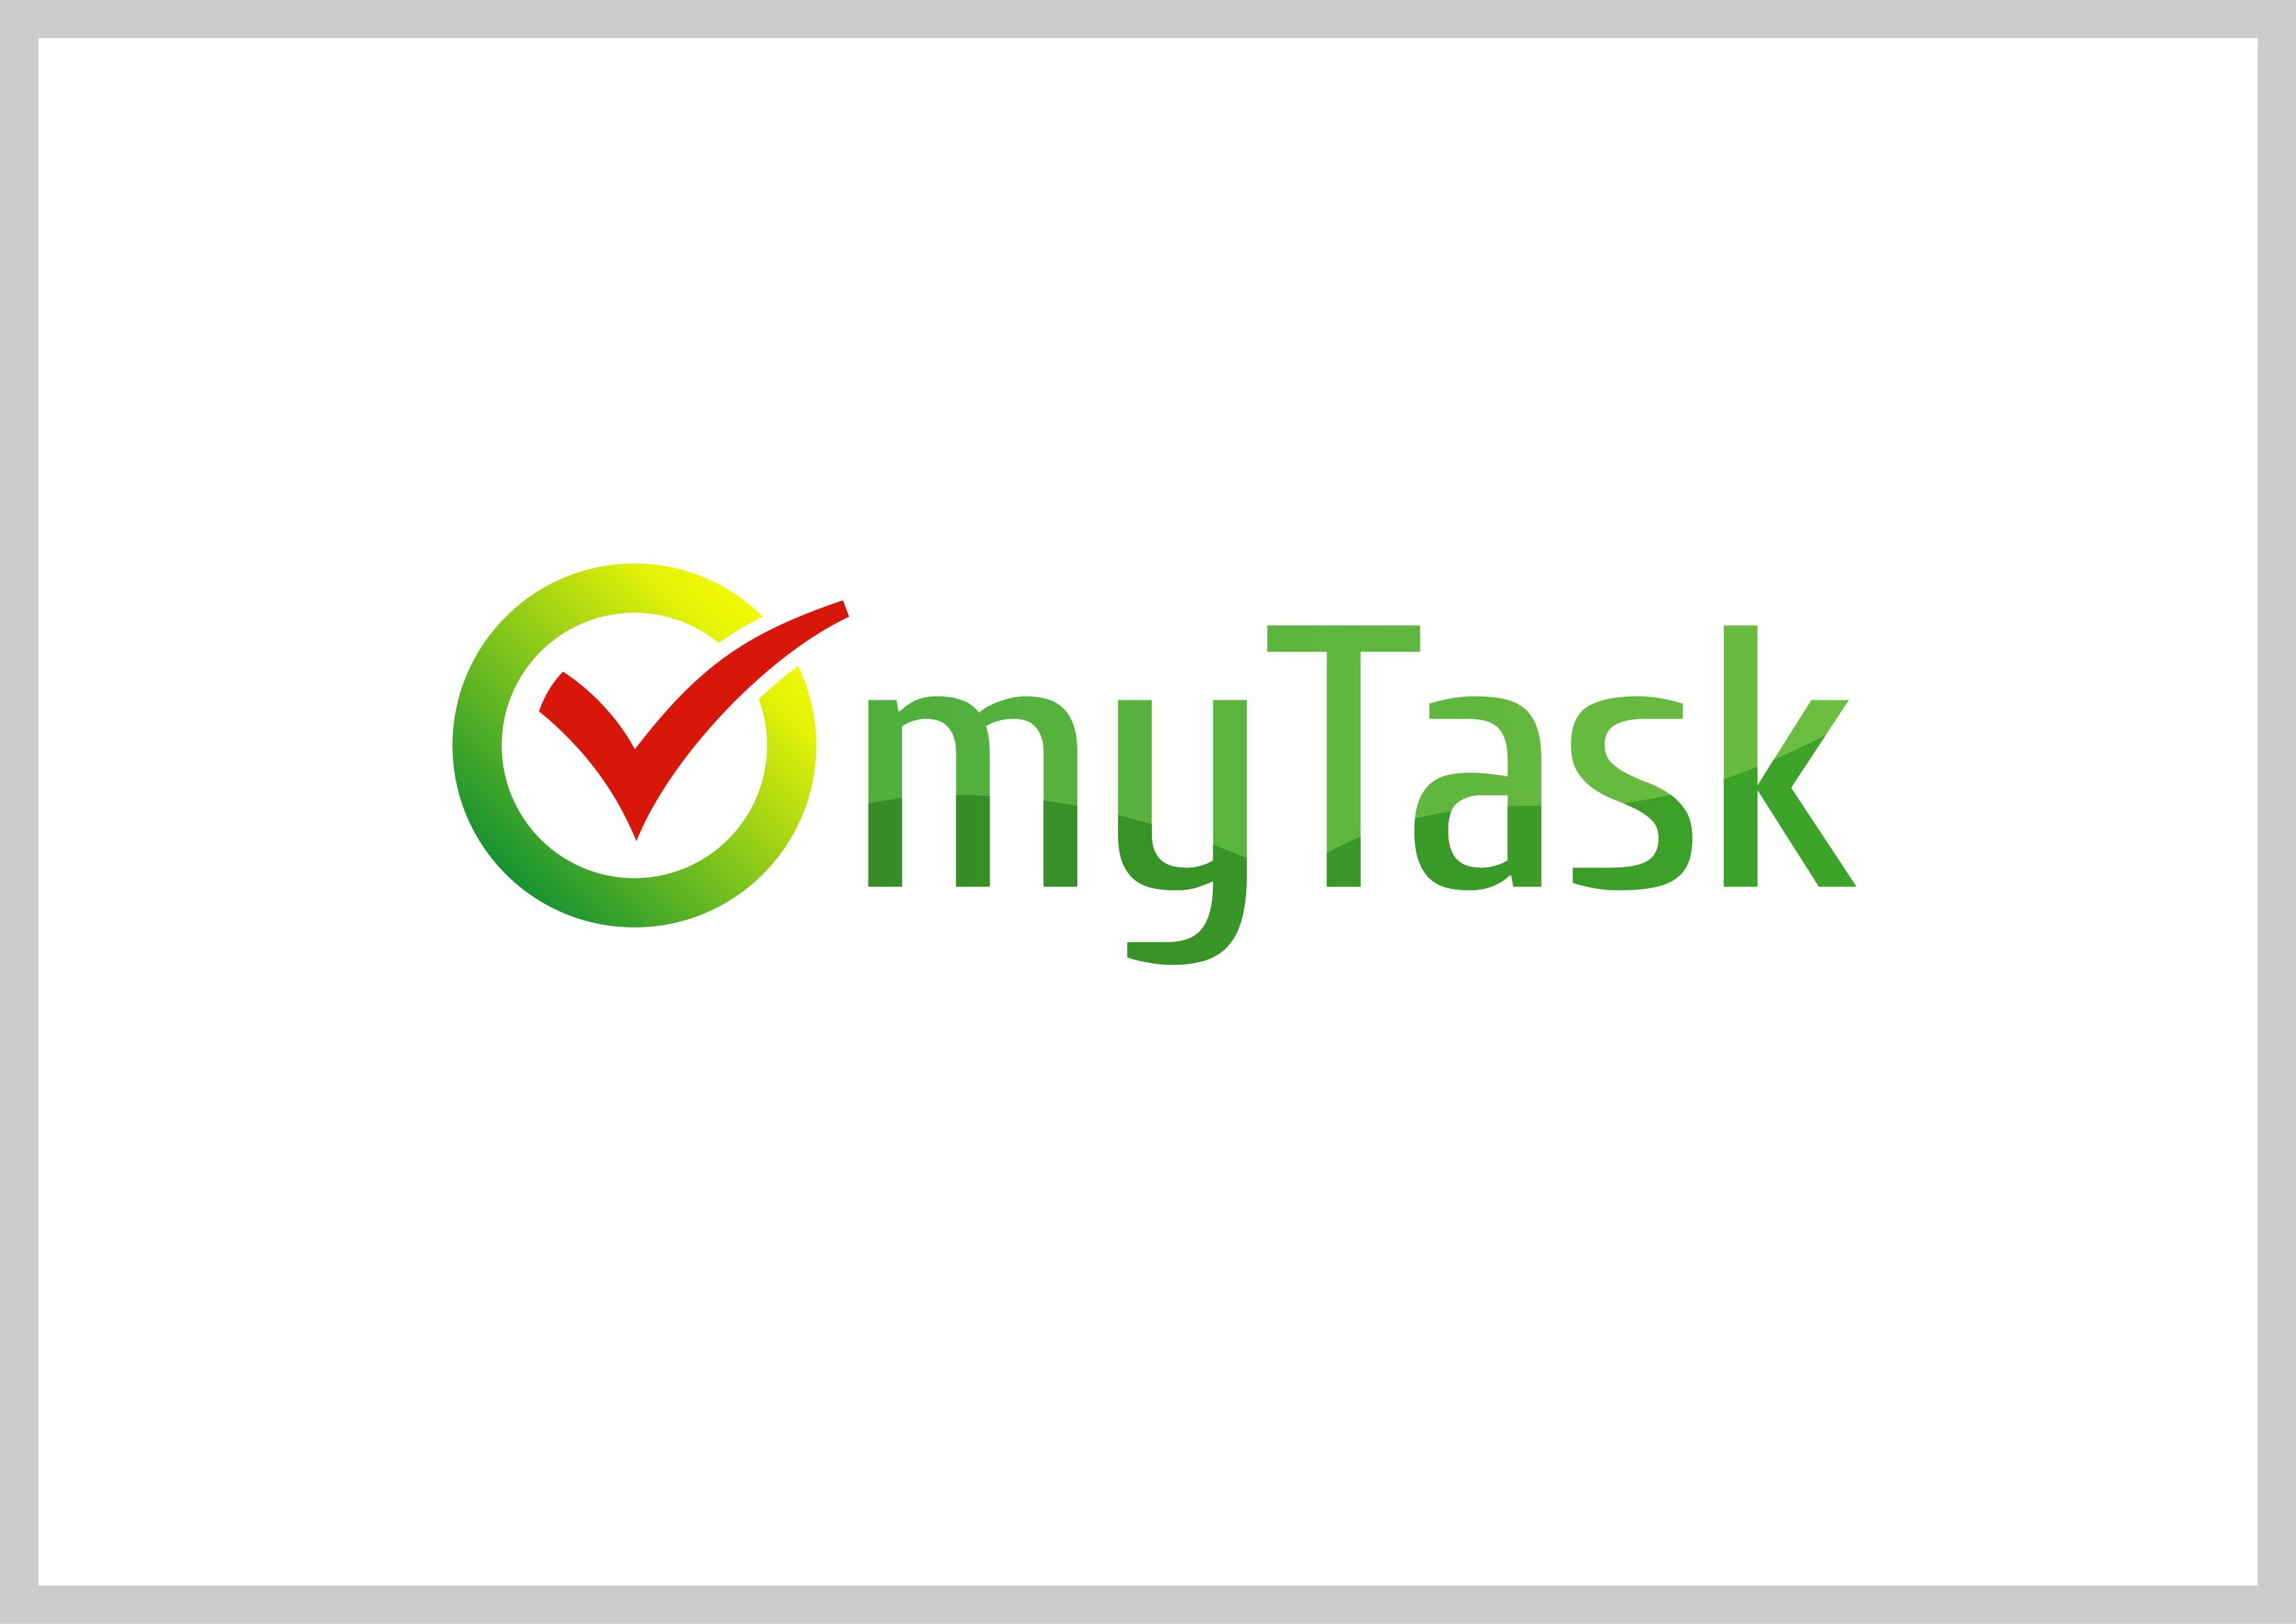 Доработка логотипа компании myTask - дизайнер LiebeMarina